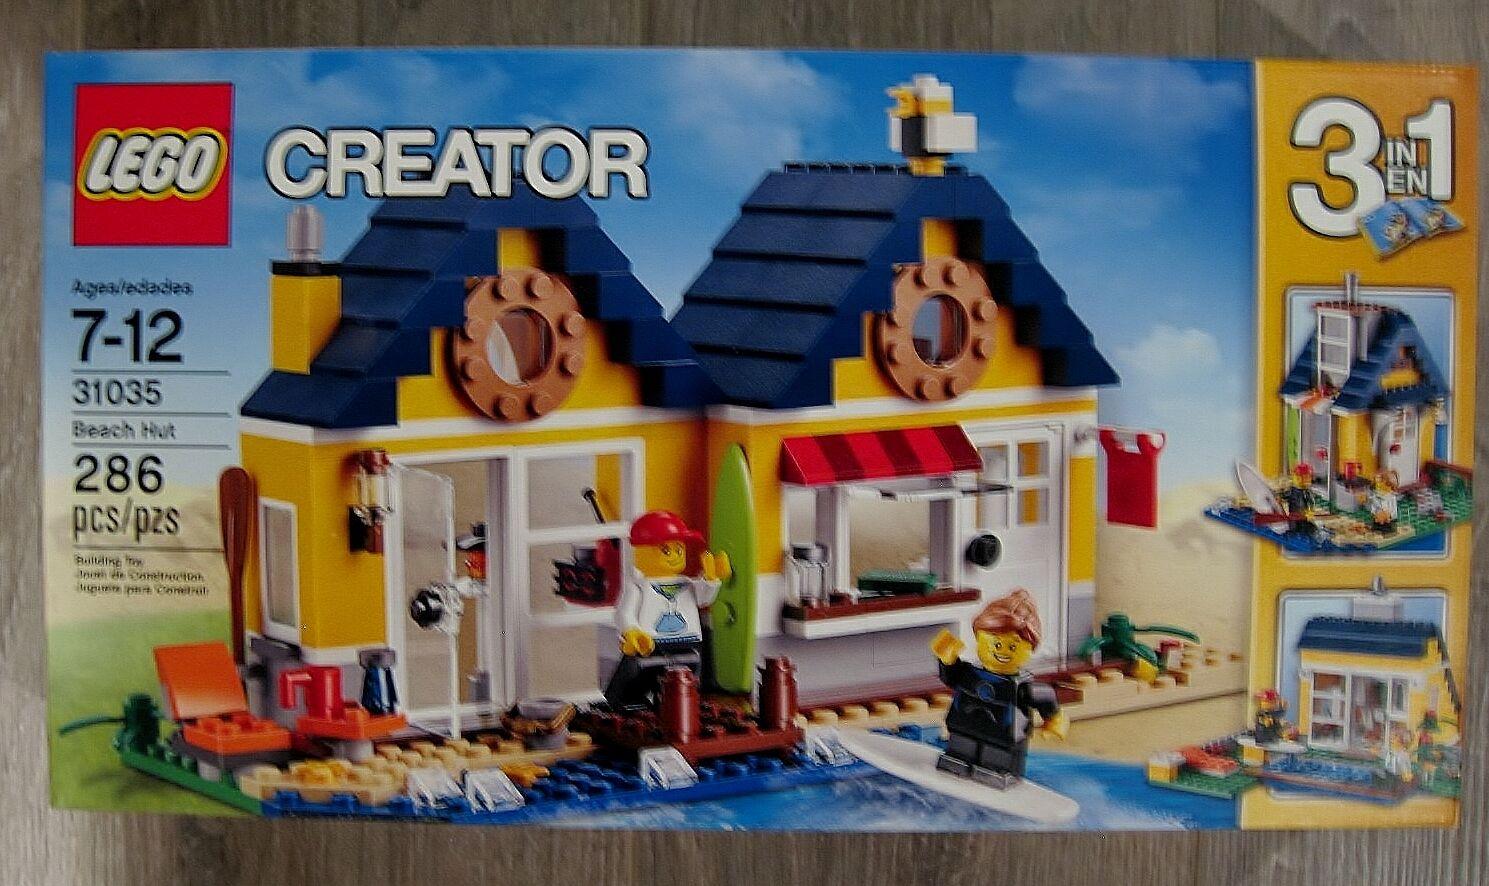 LEGO CREATOR 3 IN 1 BEACH HUT HUT HUT FACTORY SEALED 149b32